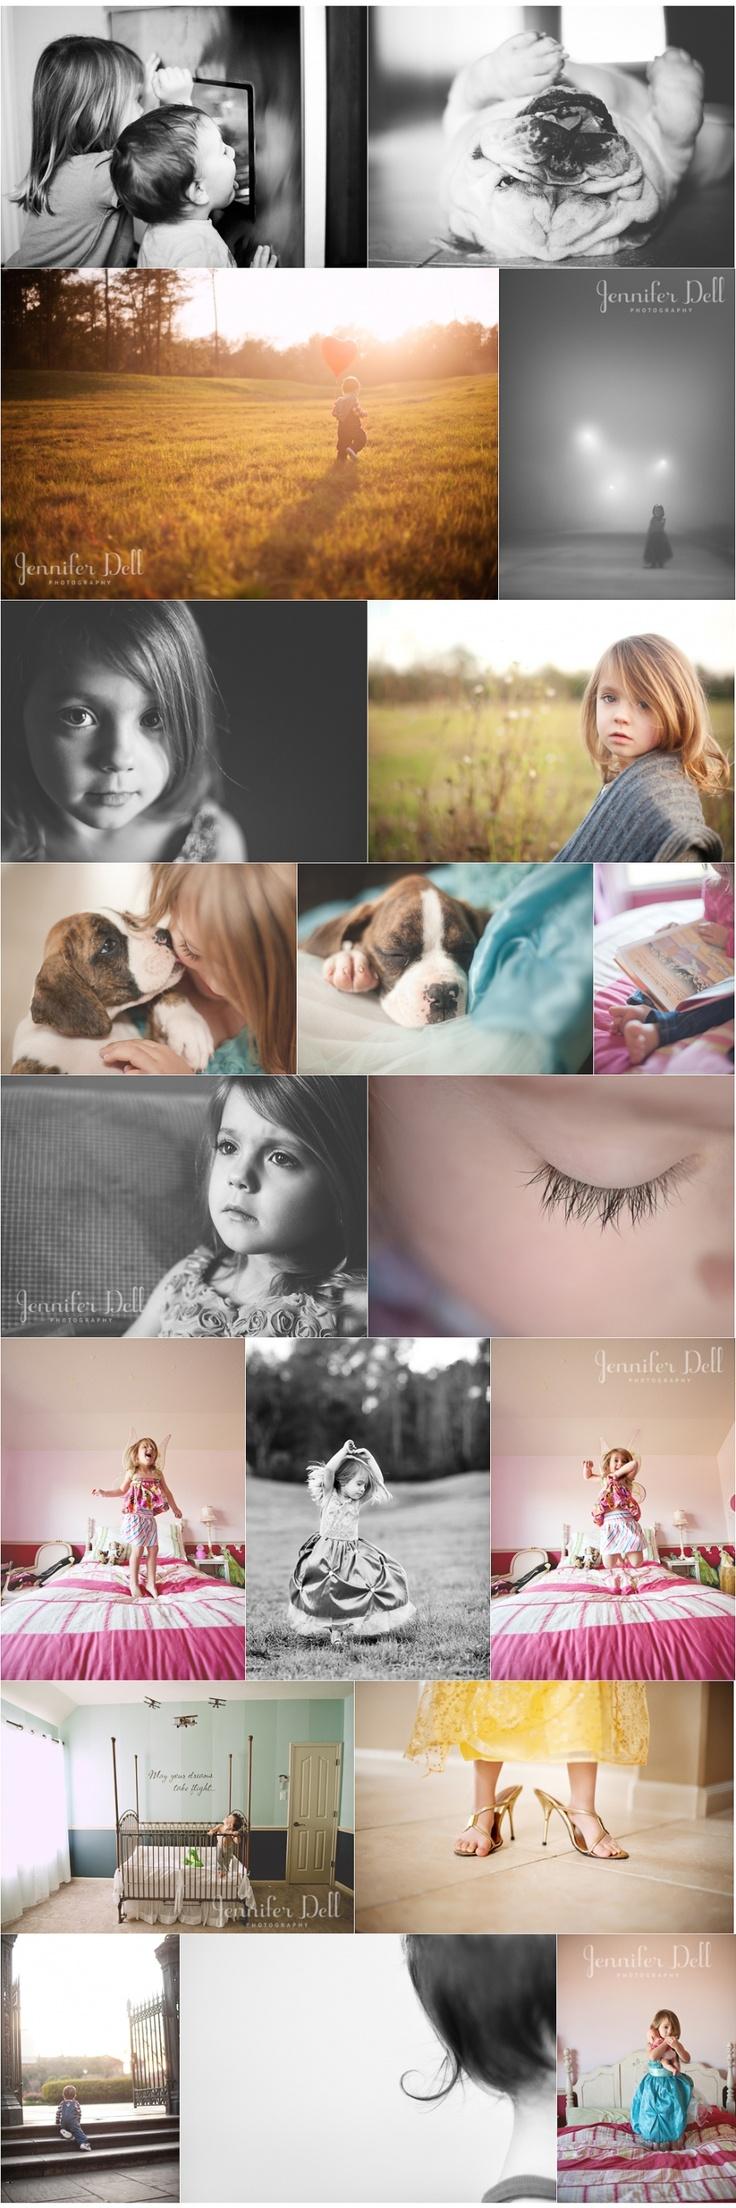 best inspiring children photos images on pinterest